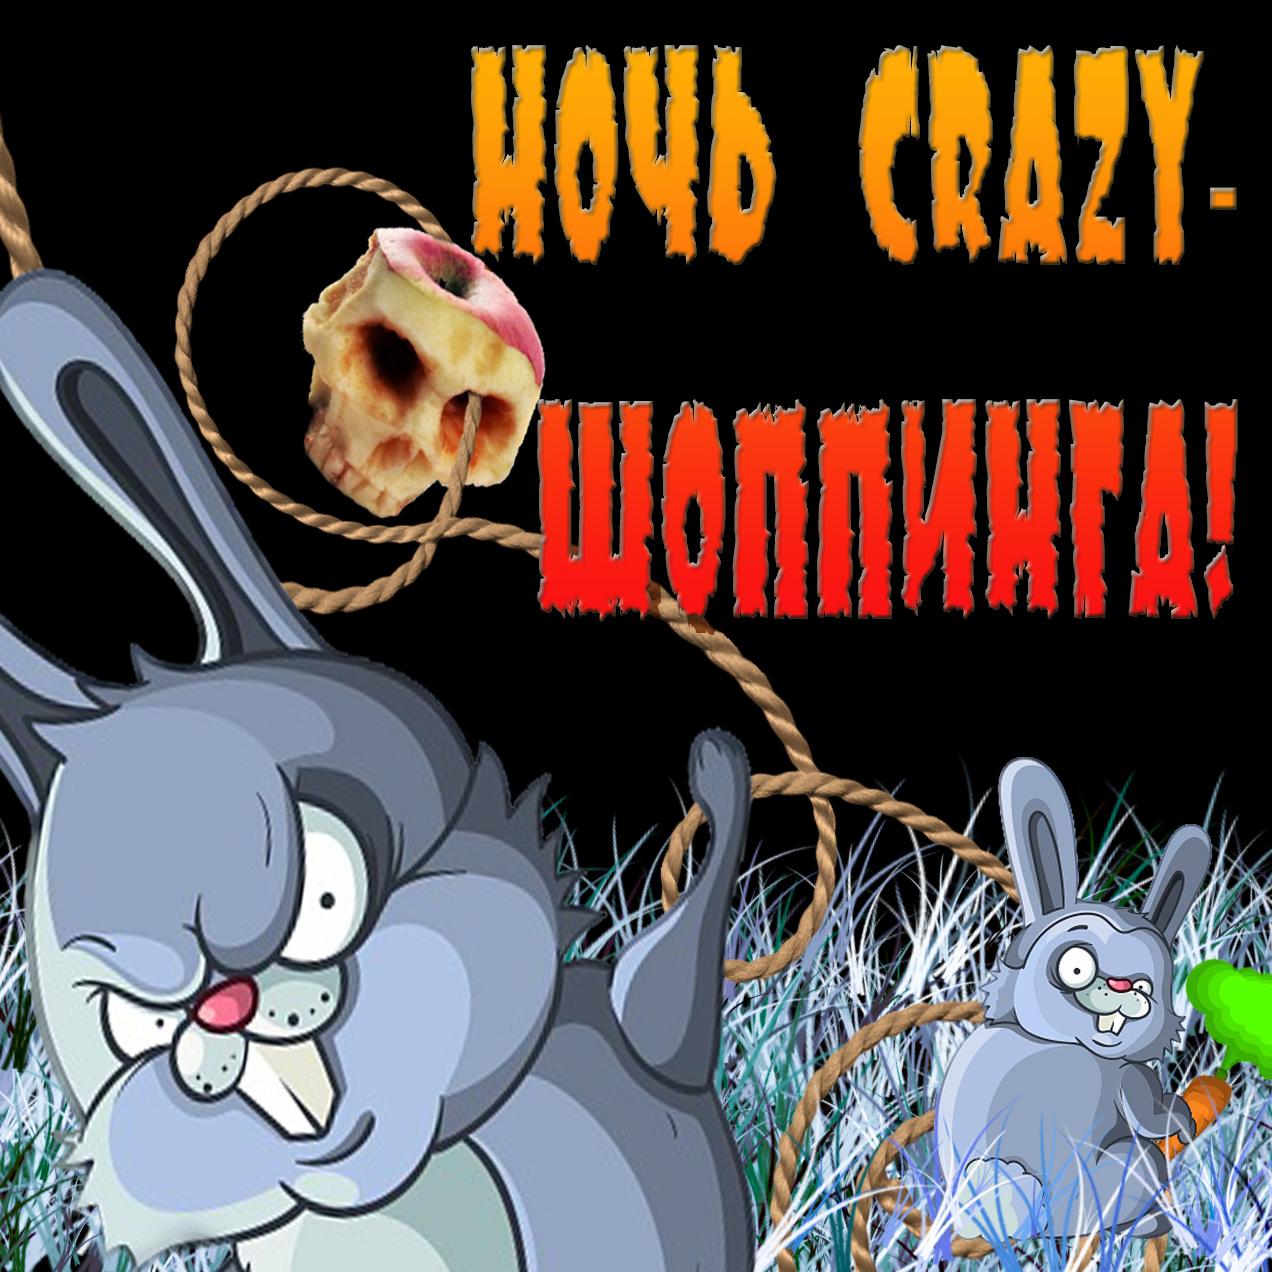 ���� CRAZY-��������!!! �� ��������!